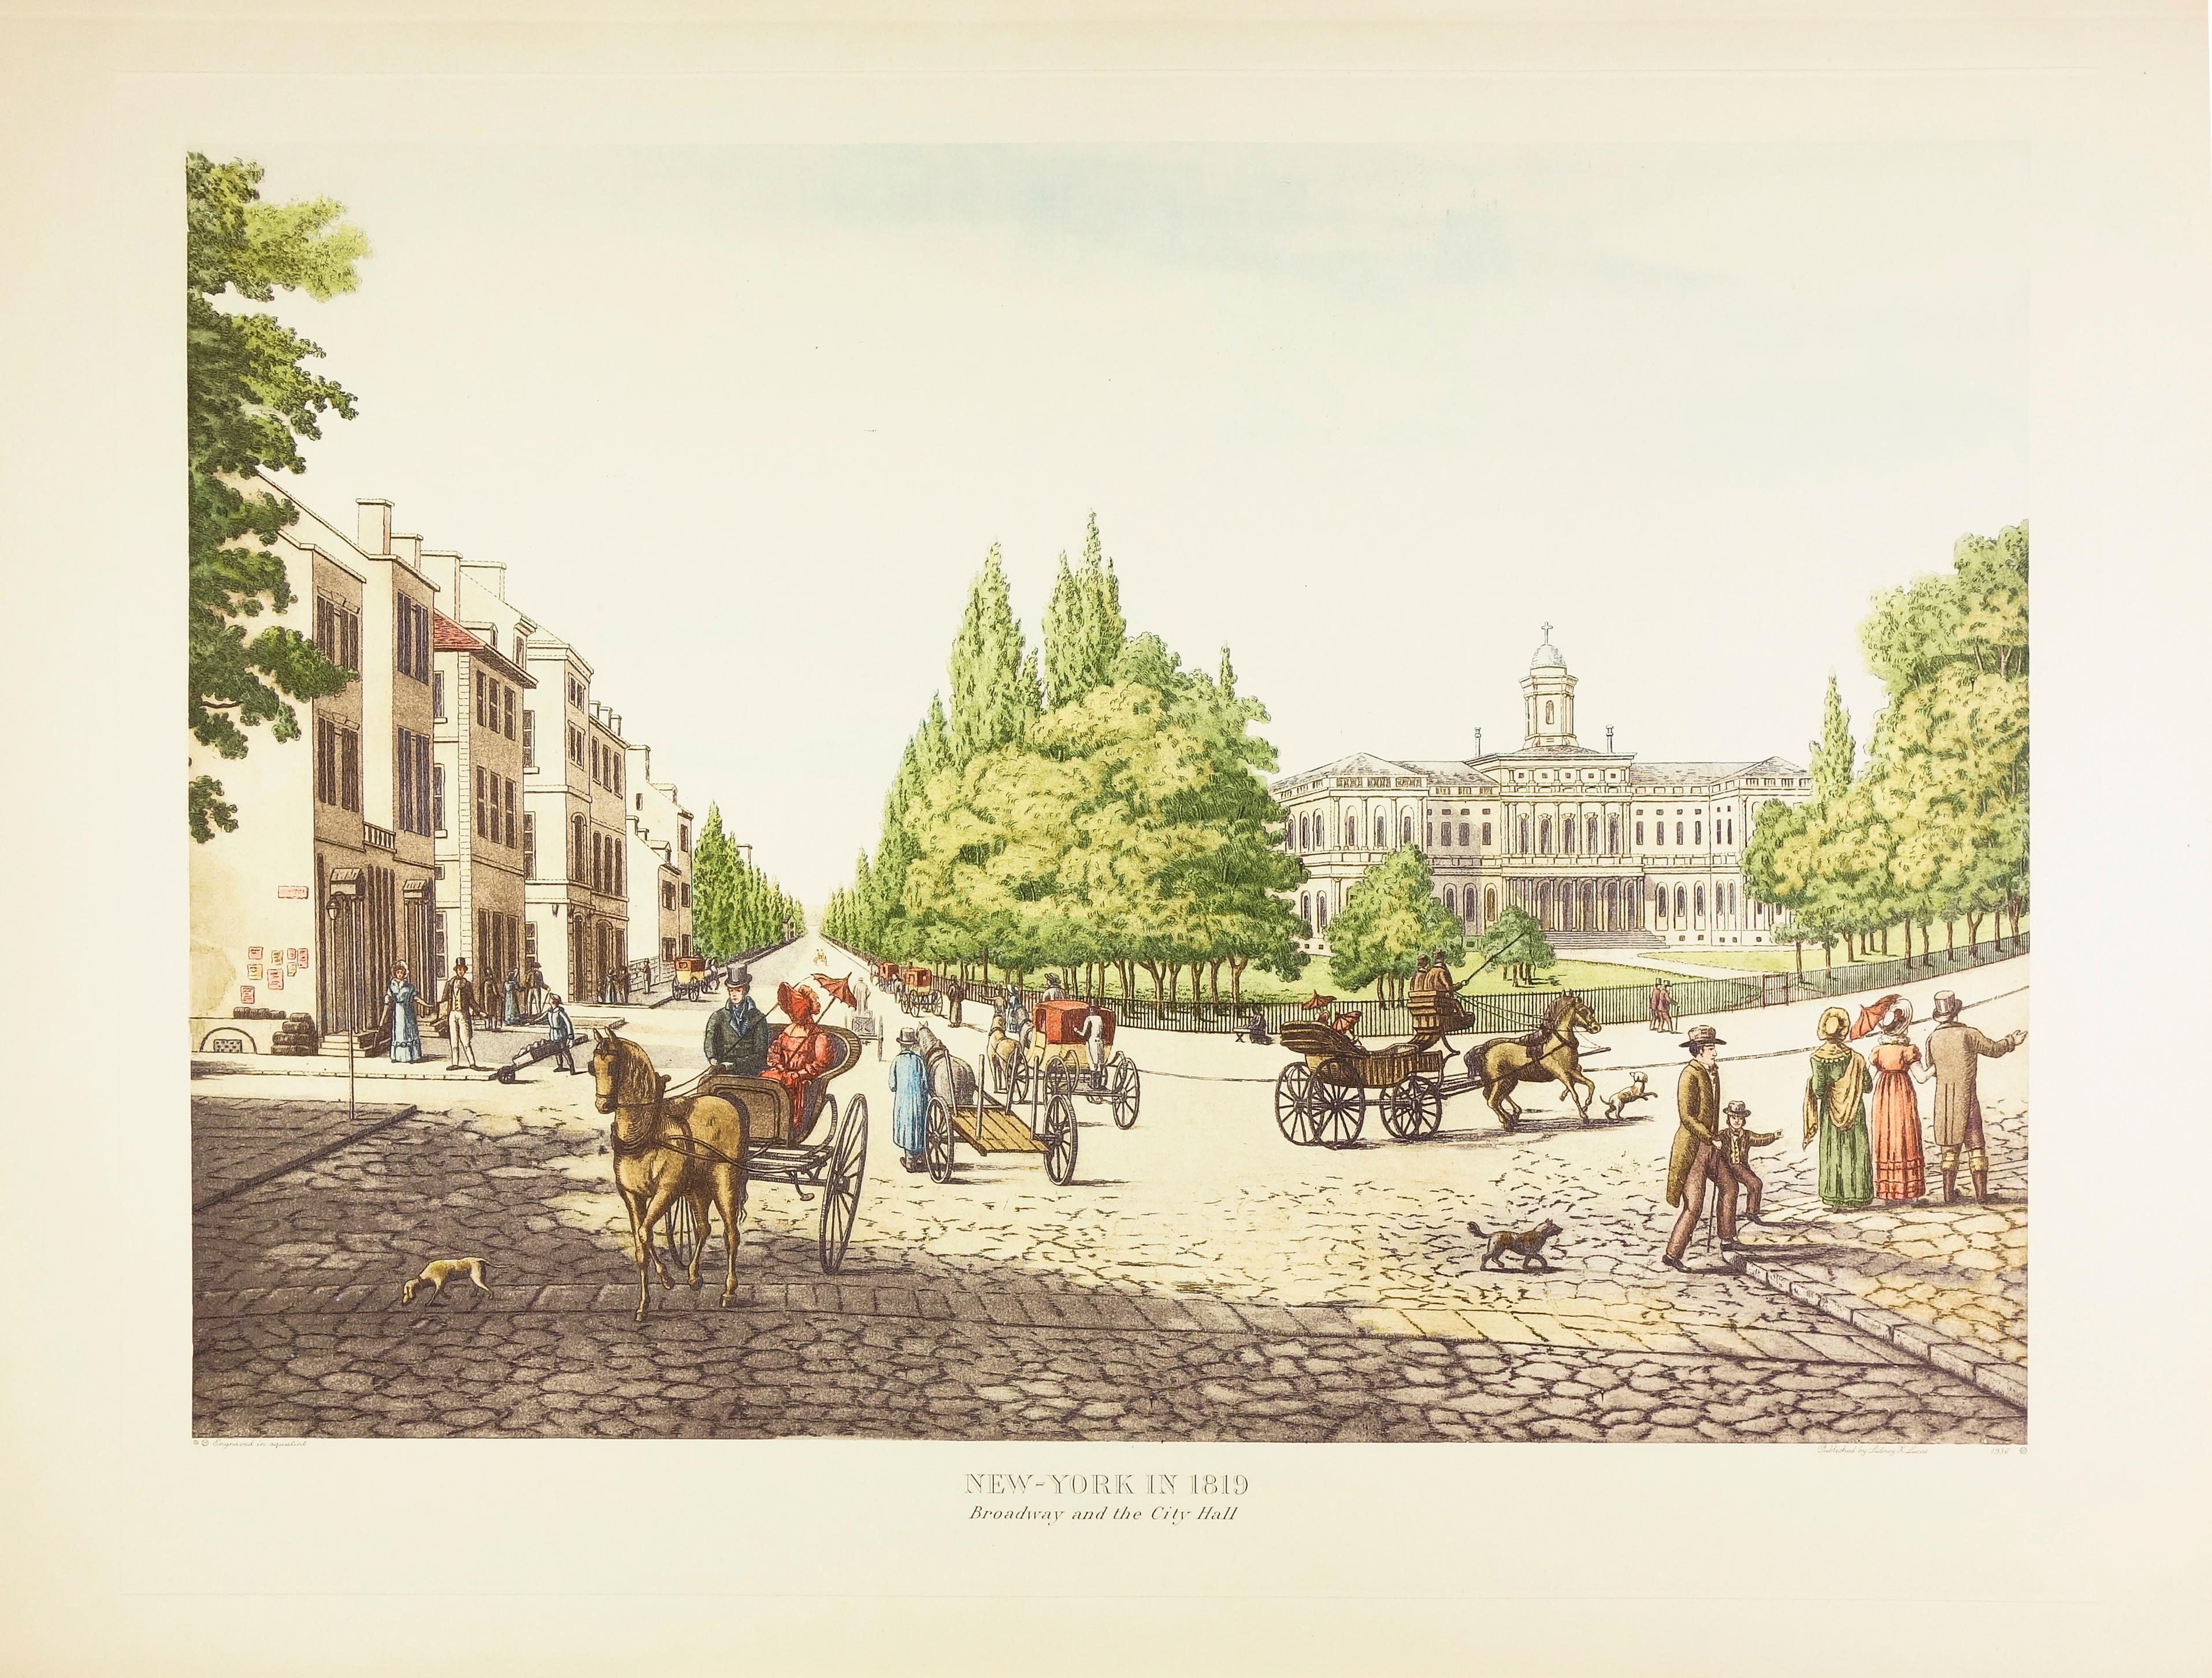 New York in 1819, Broadway & City Hall